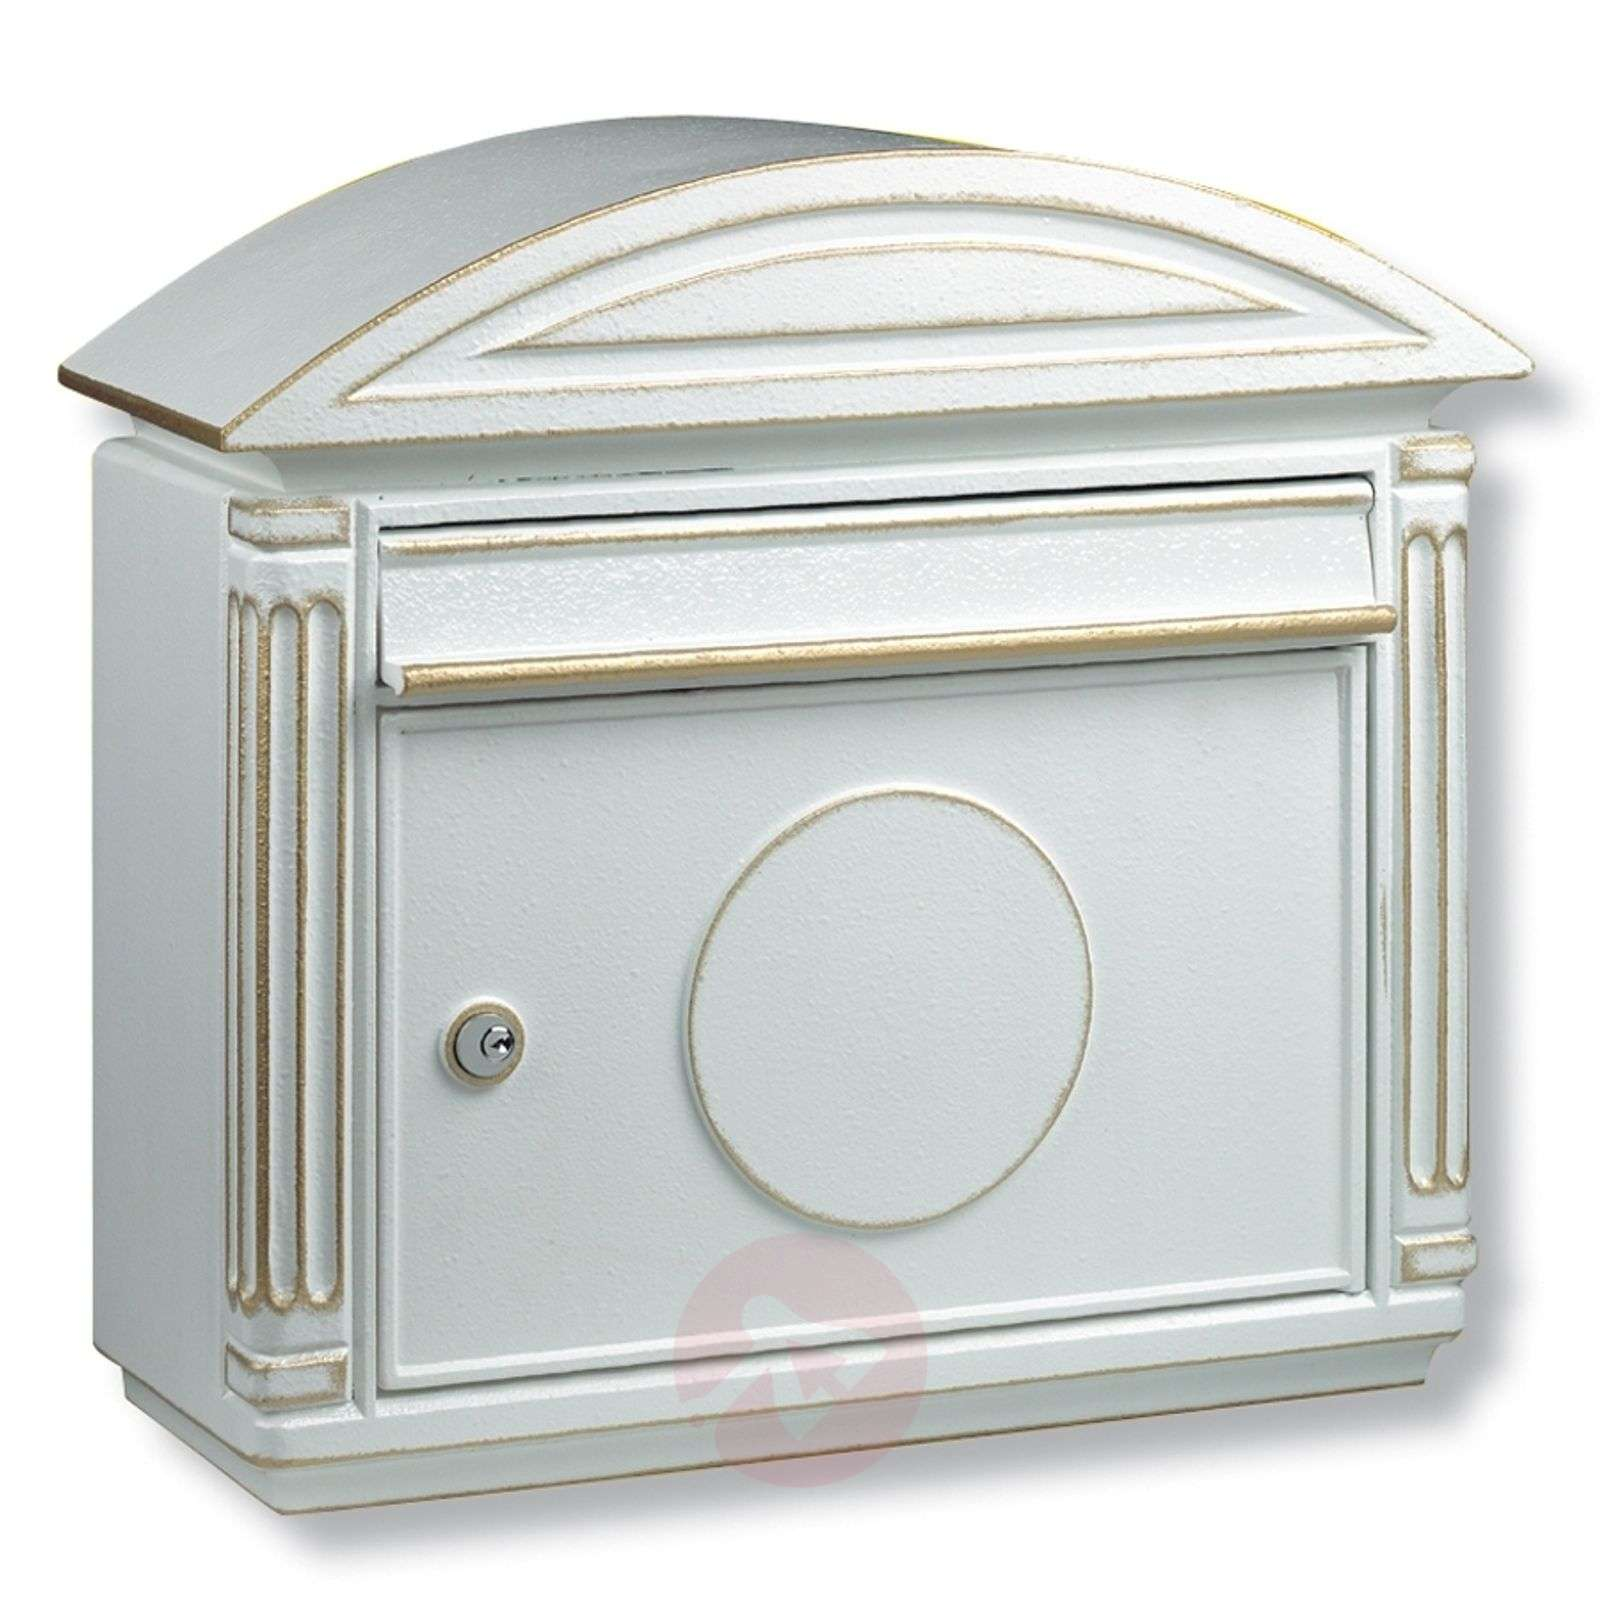 Venezia-postilaatikko painevalualumiinia-1532047X-01